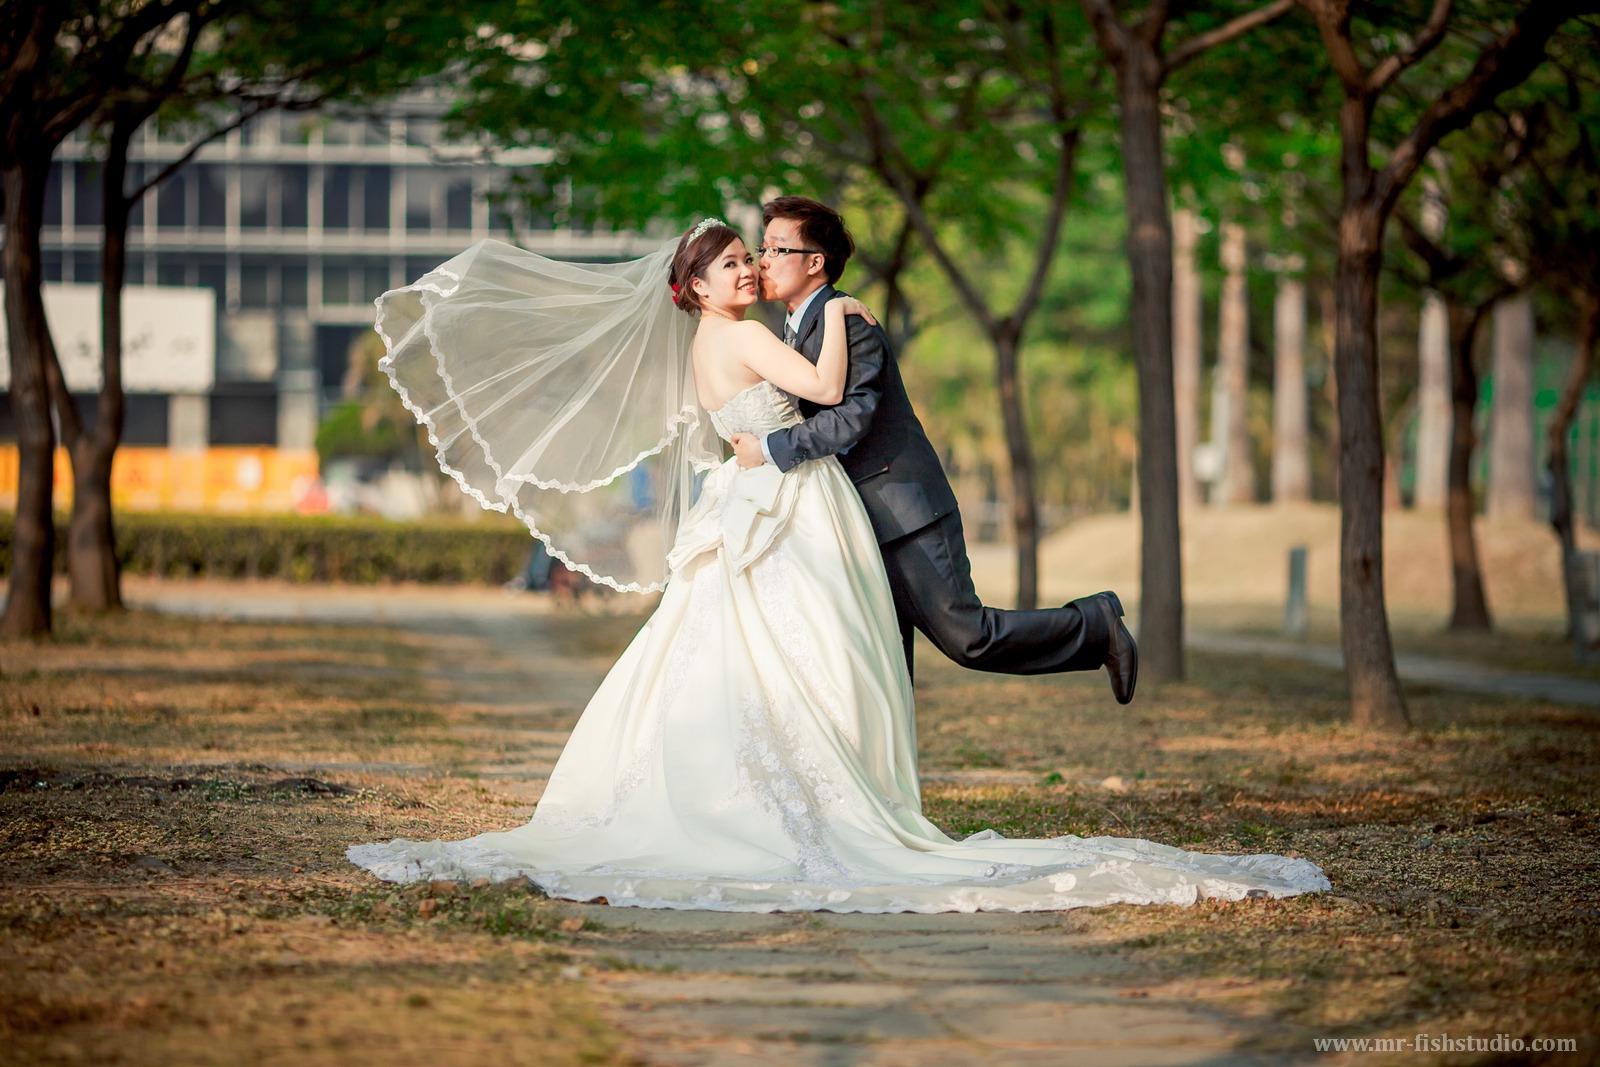 【Wedding】宇歆+宗宏婚禮精選